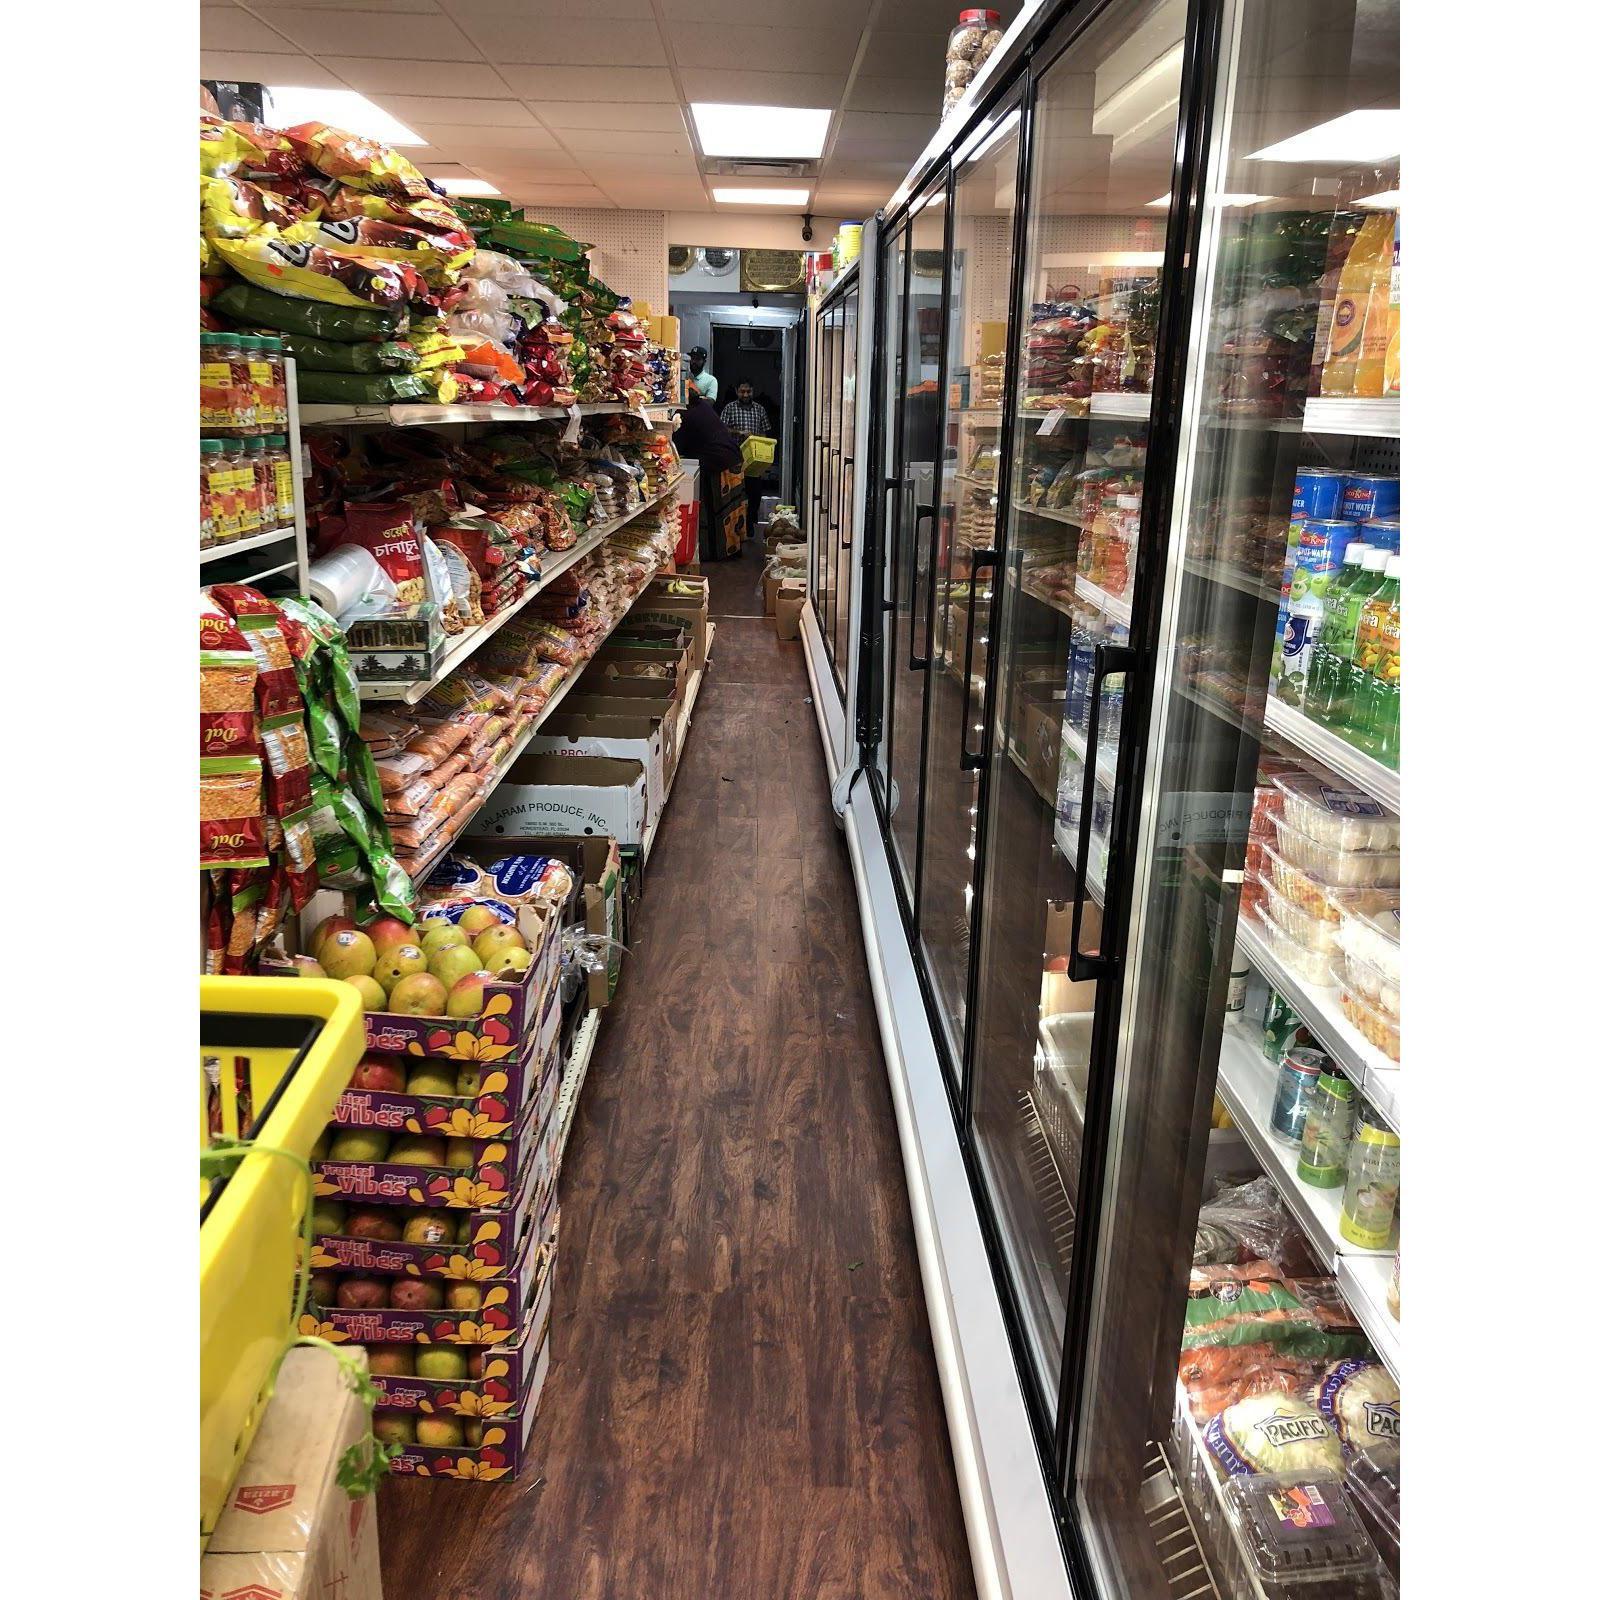 Zubaidah Halal Meat and Grocery - Buffalo, NY 14211 - (716)240-0062   ShowMeLocal.com